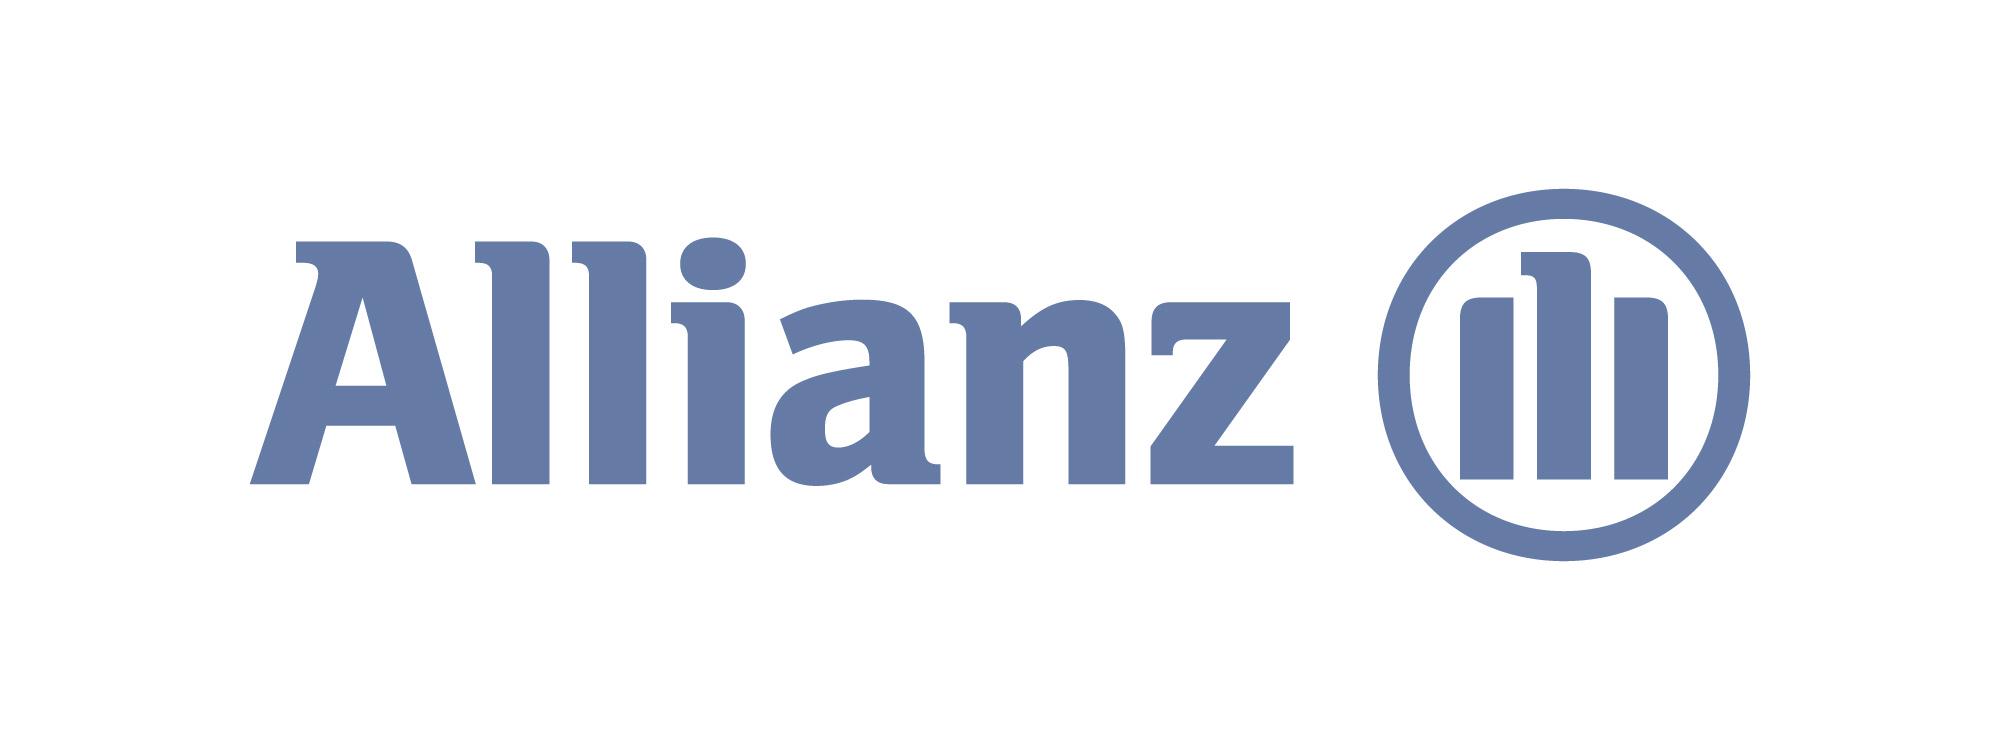 Bond-street-languages_Client_Allianz blue.jpg